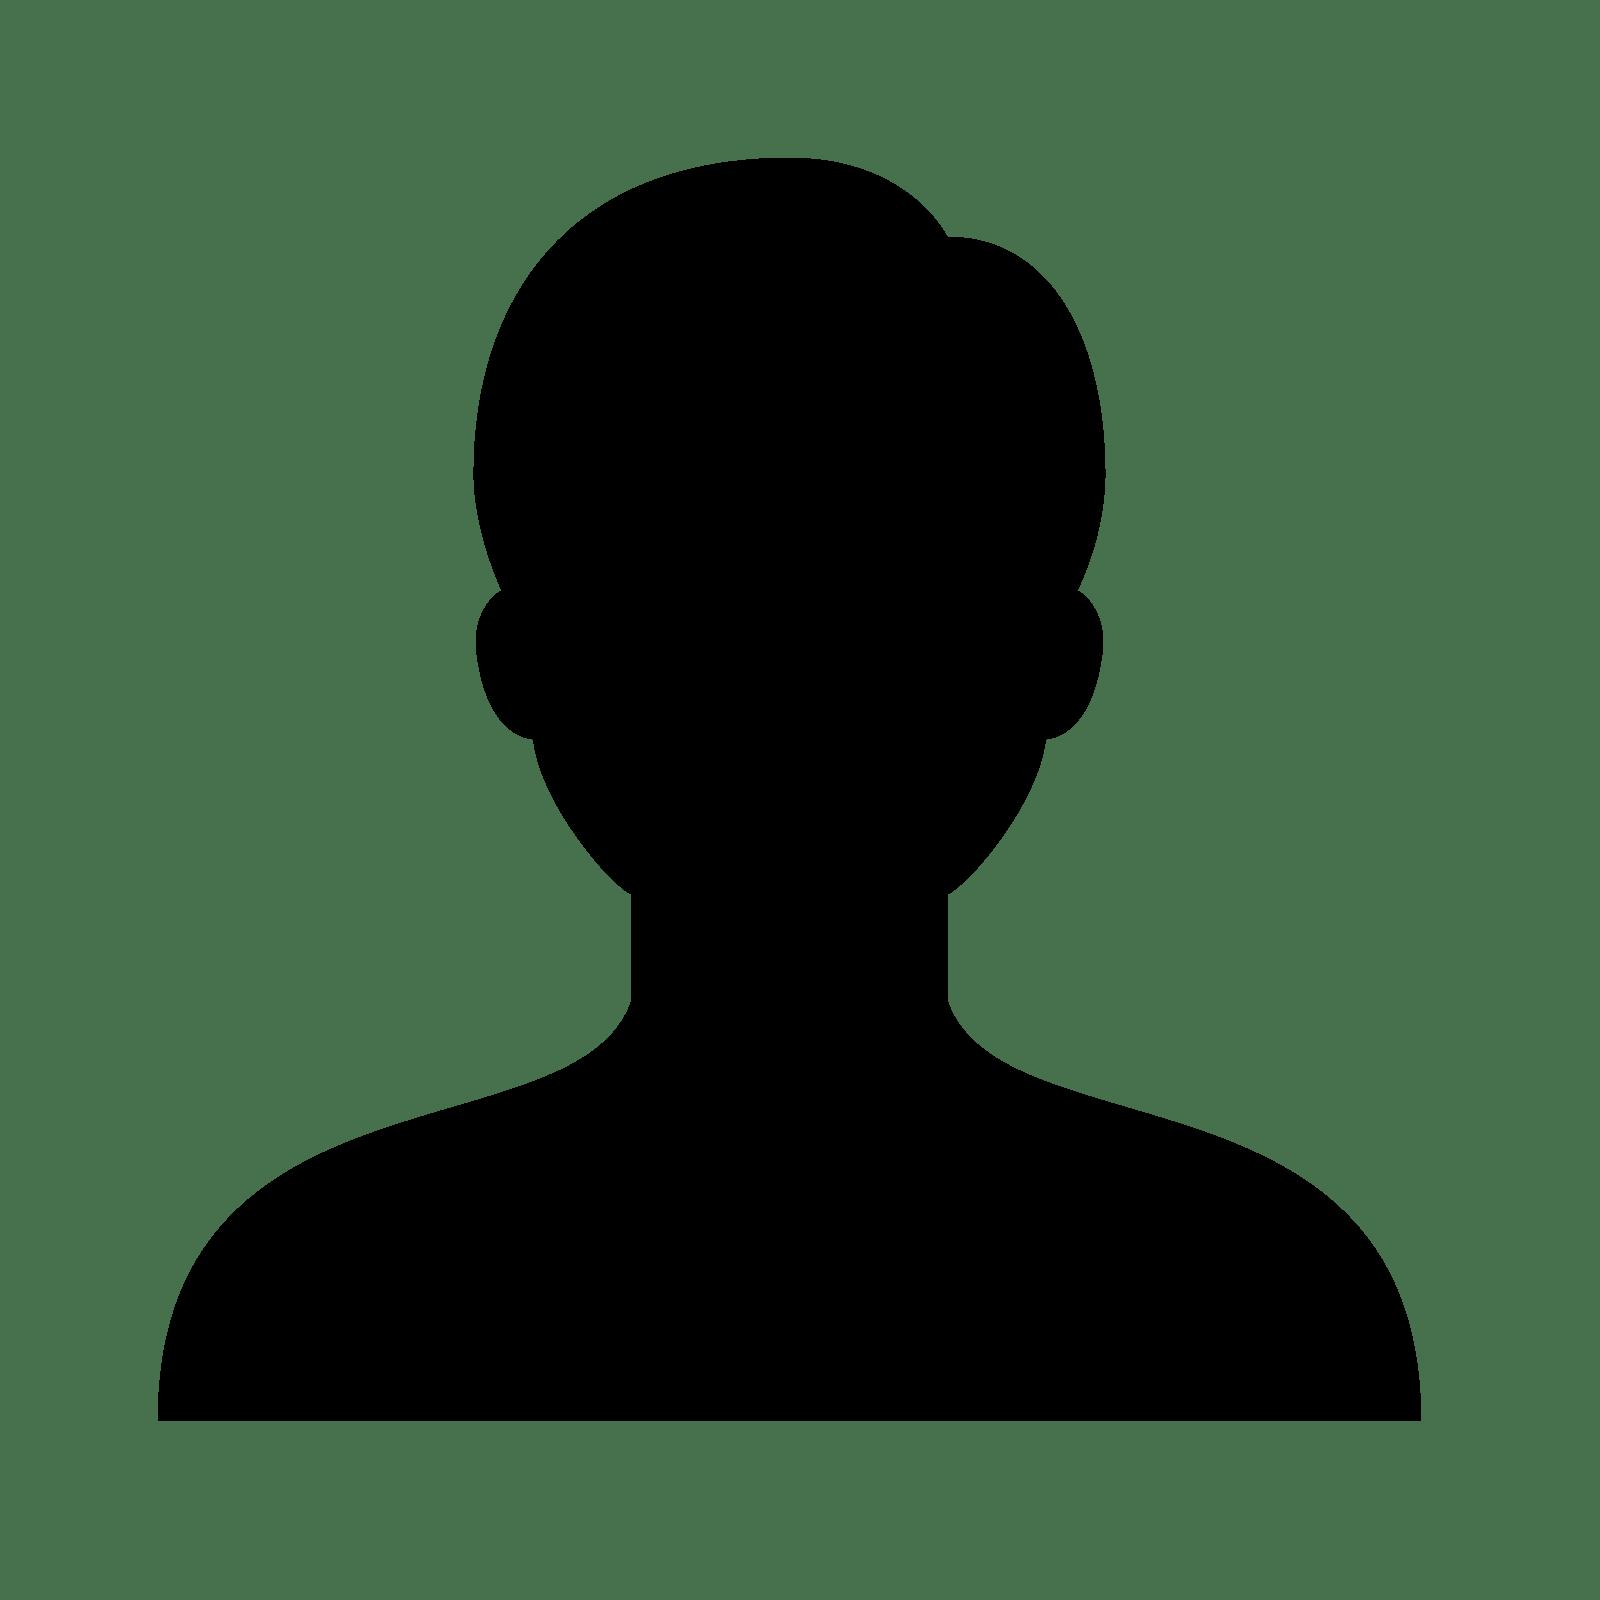 1600x1600 Male Head Silhouette Logo